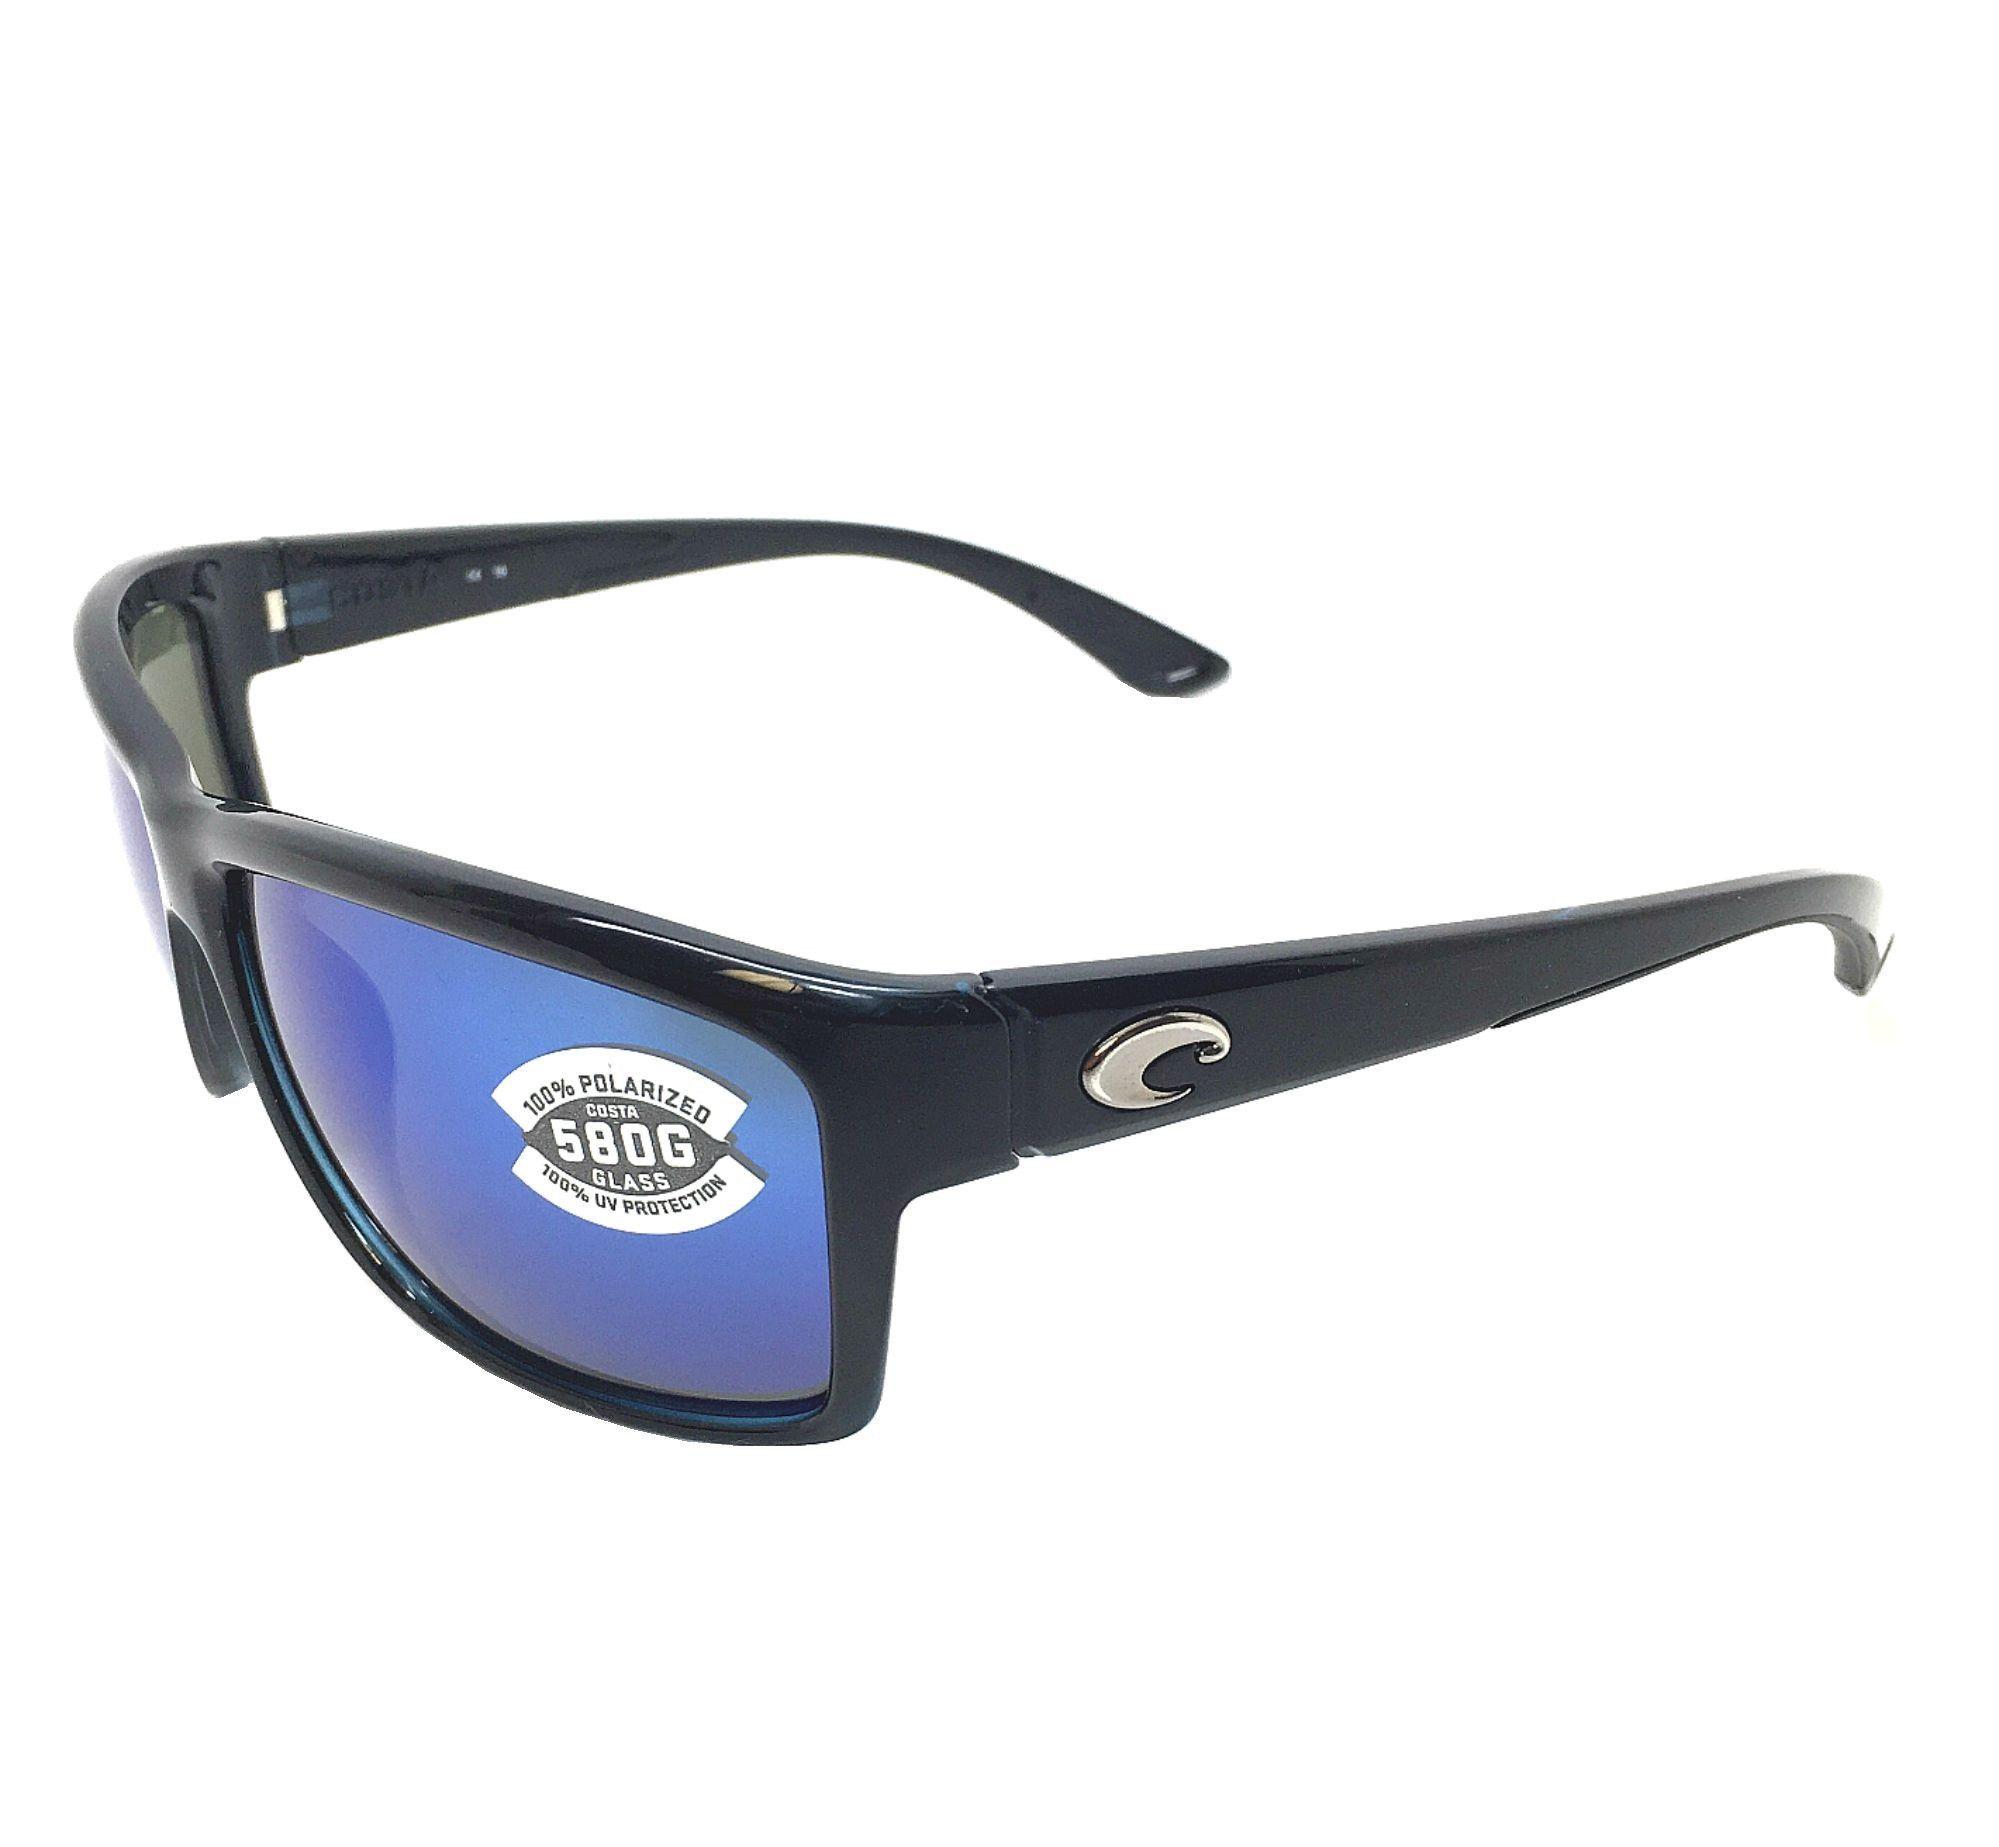 a88cb50aee1 Costa Del Mar Mag Bay 580G Black Blue Mirror Polarized Sunglasses ...